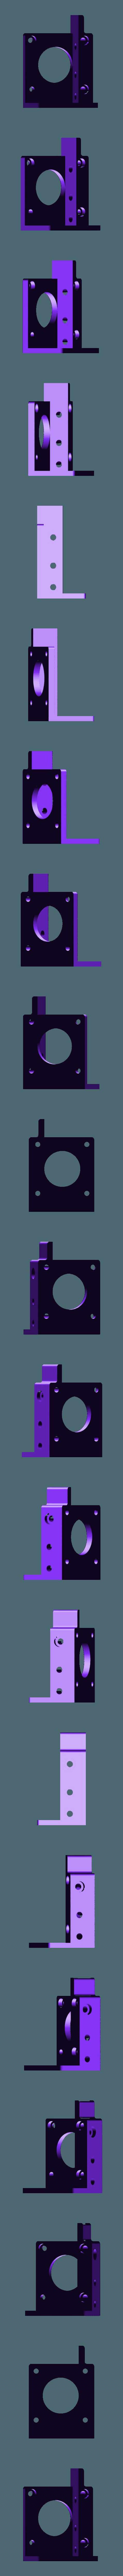 Direct_Drive_Extruder_main_body.stl Download free STL file FDM Printer de Kleine Reus 300x300x900 • 3D printable object, Job